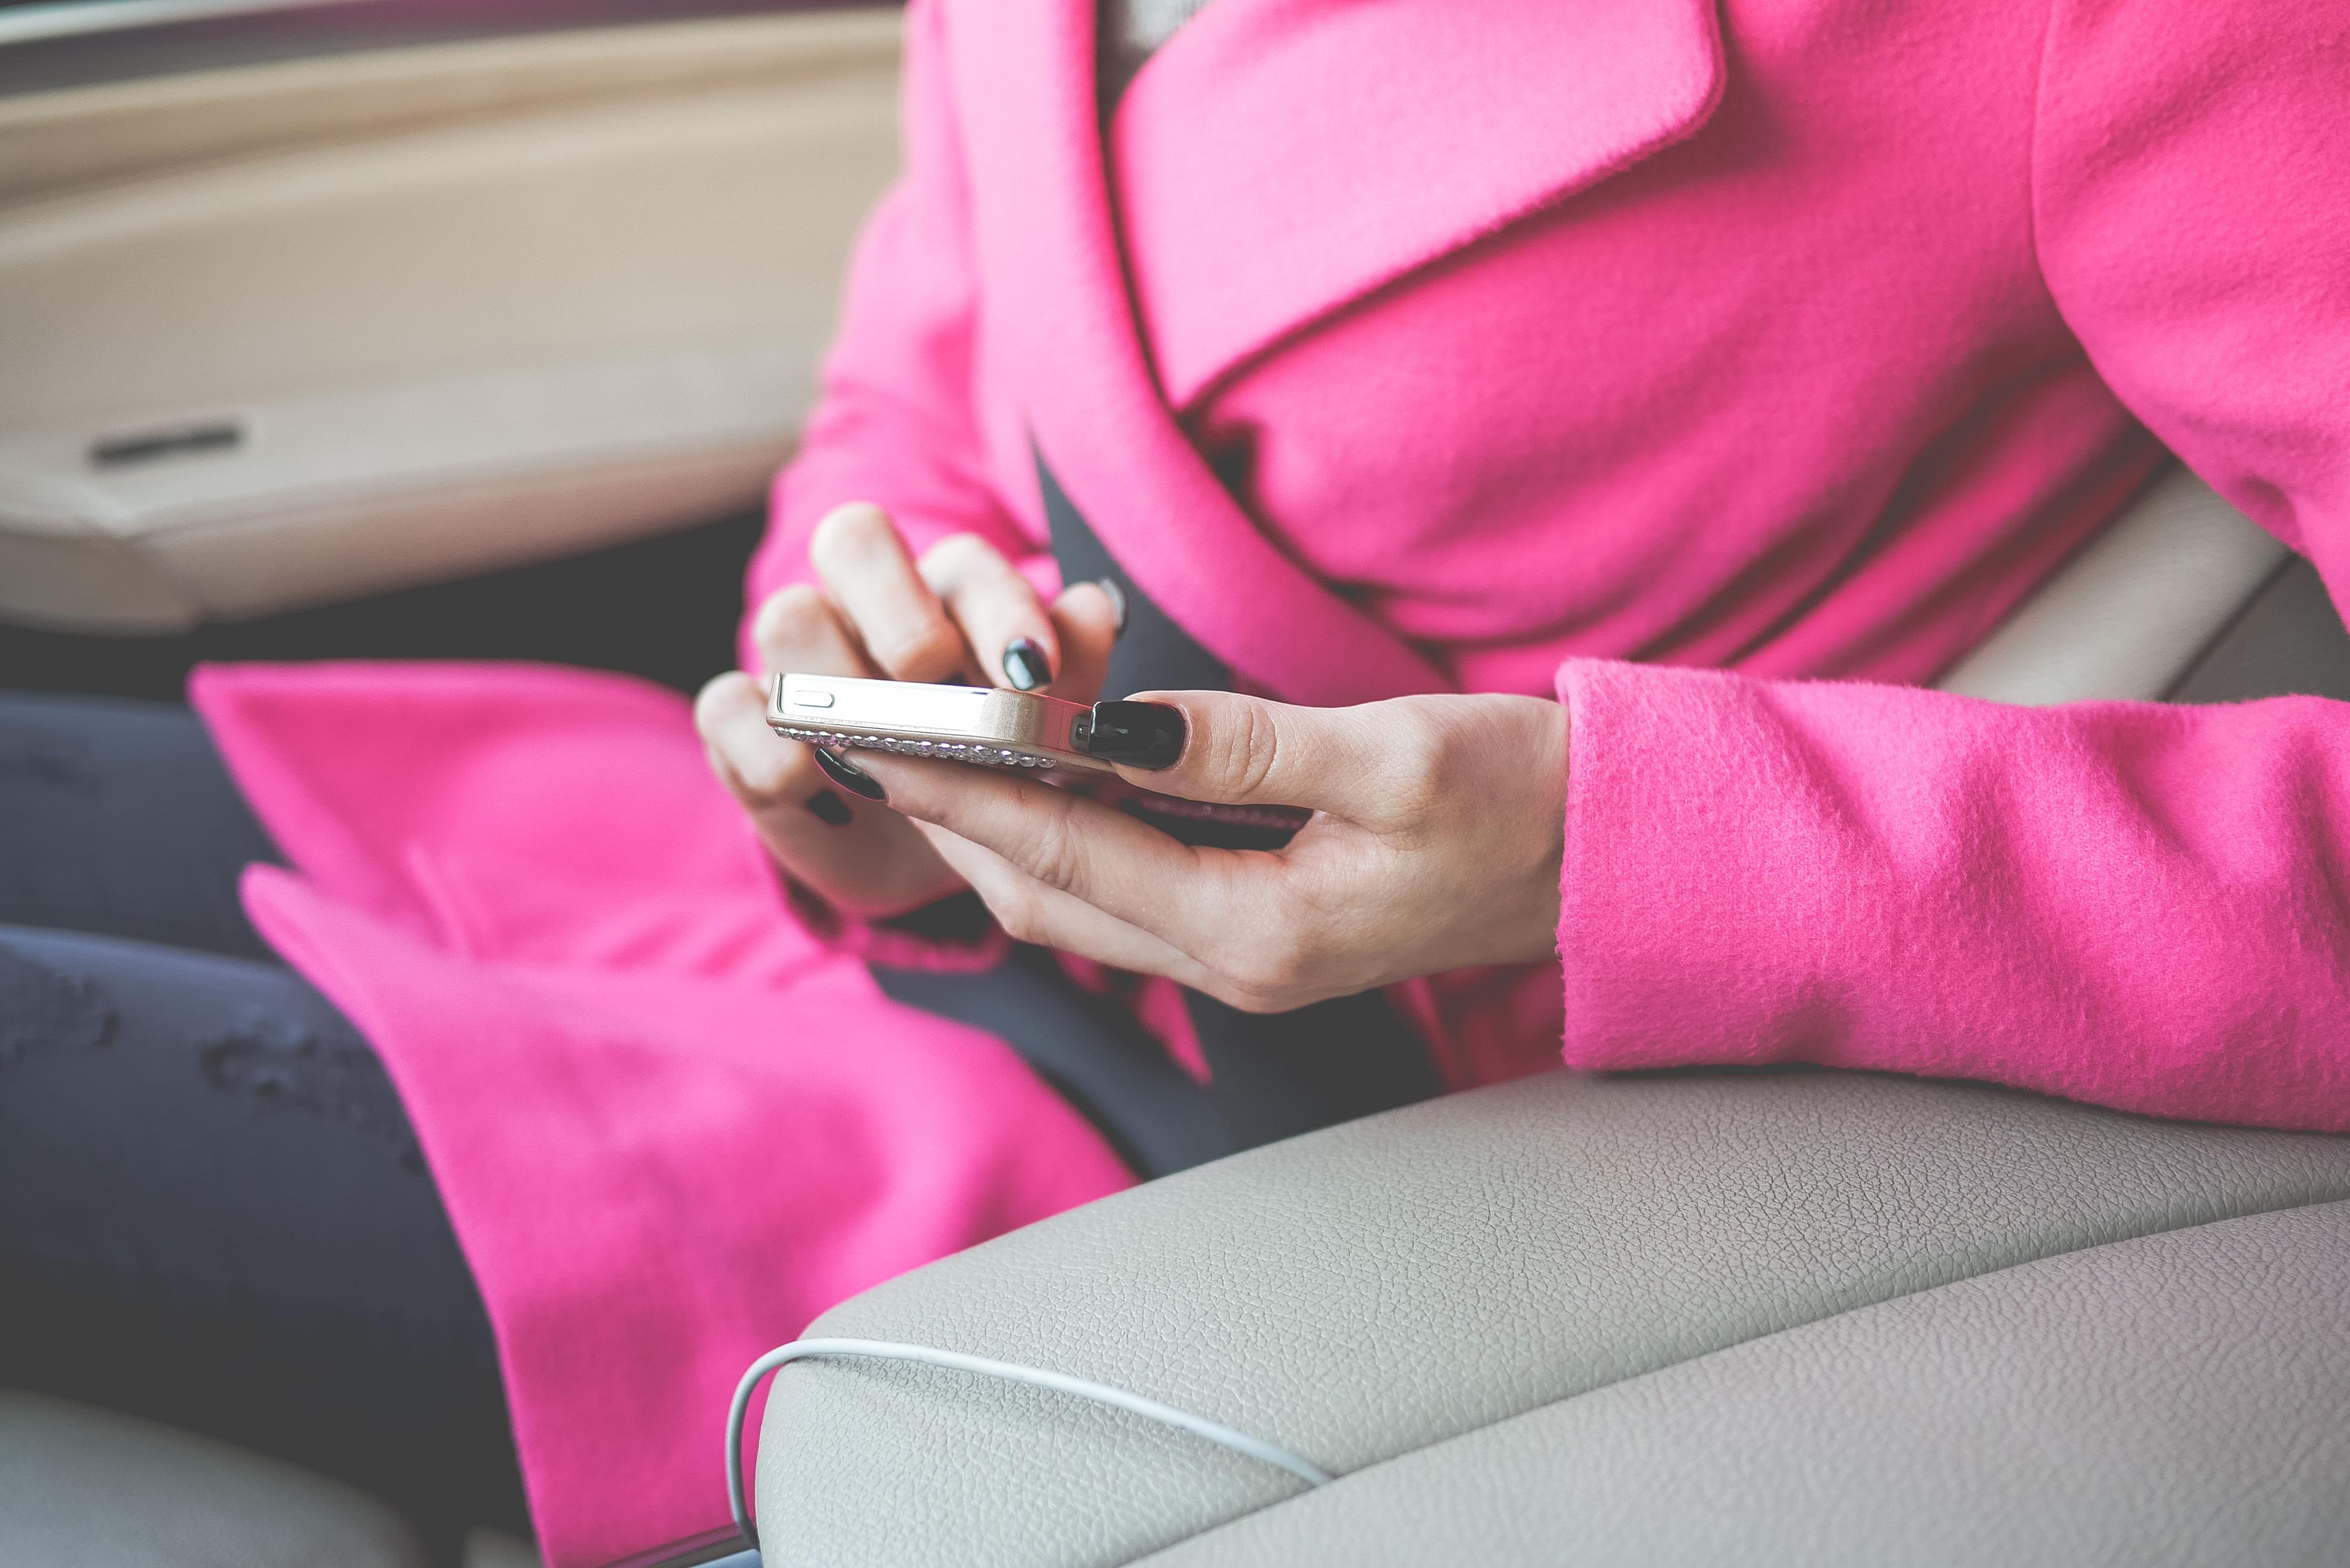 seguros para telefonos moviles